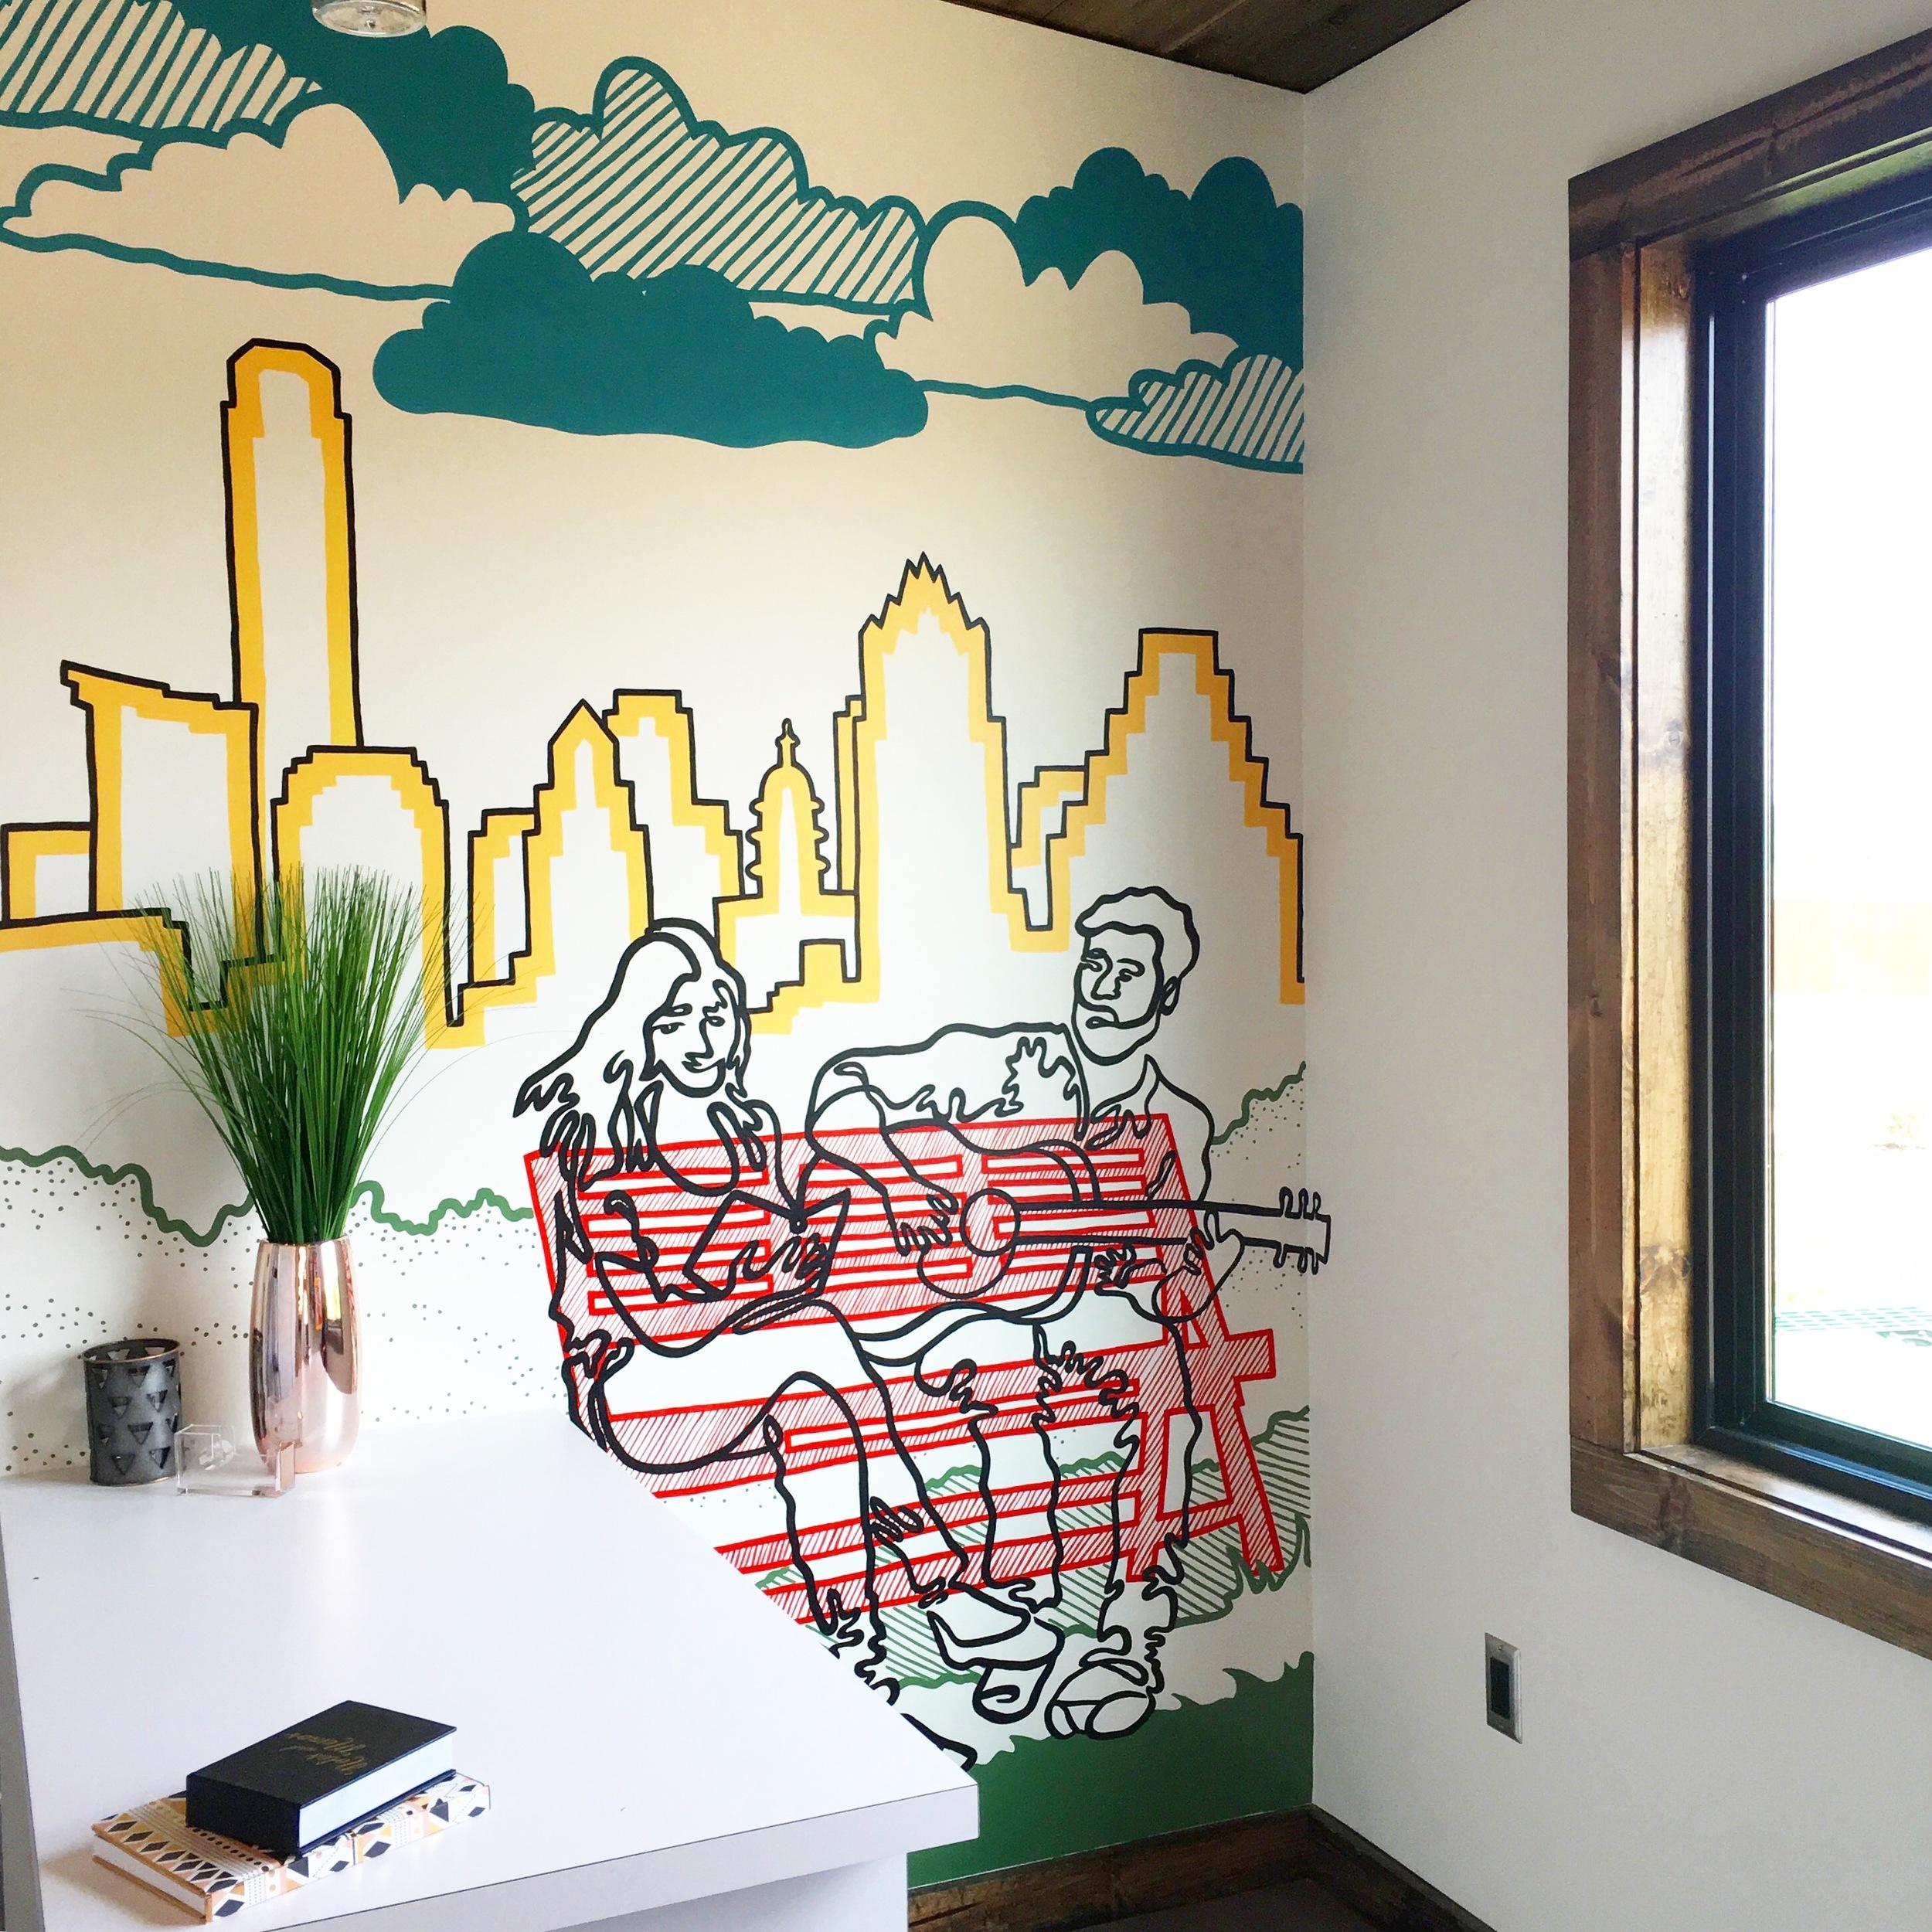 Easton Park Office, Southeast Austin